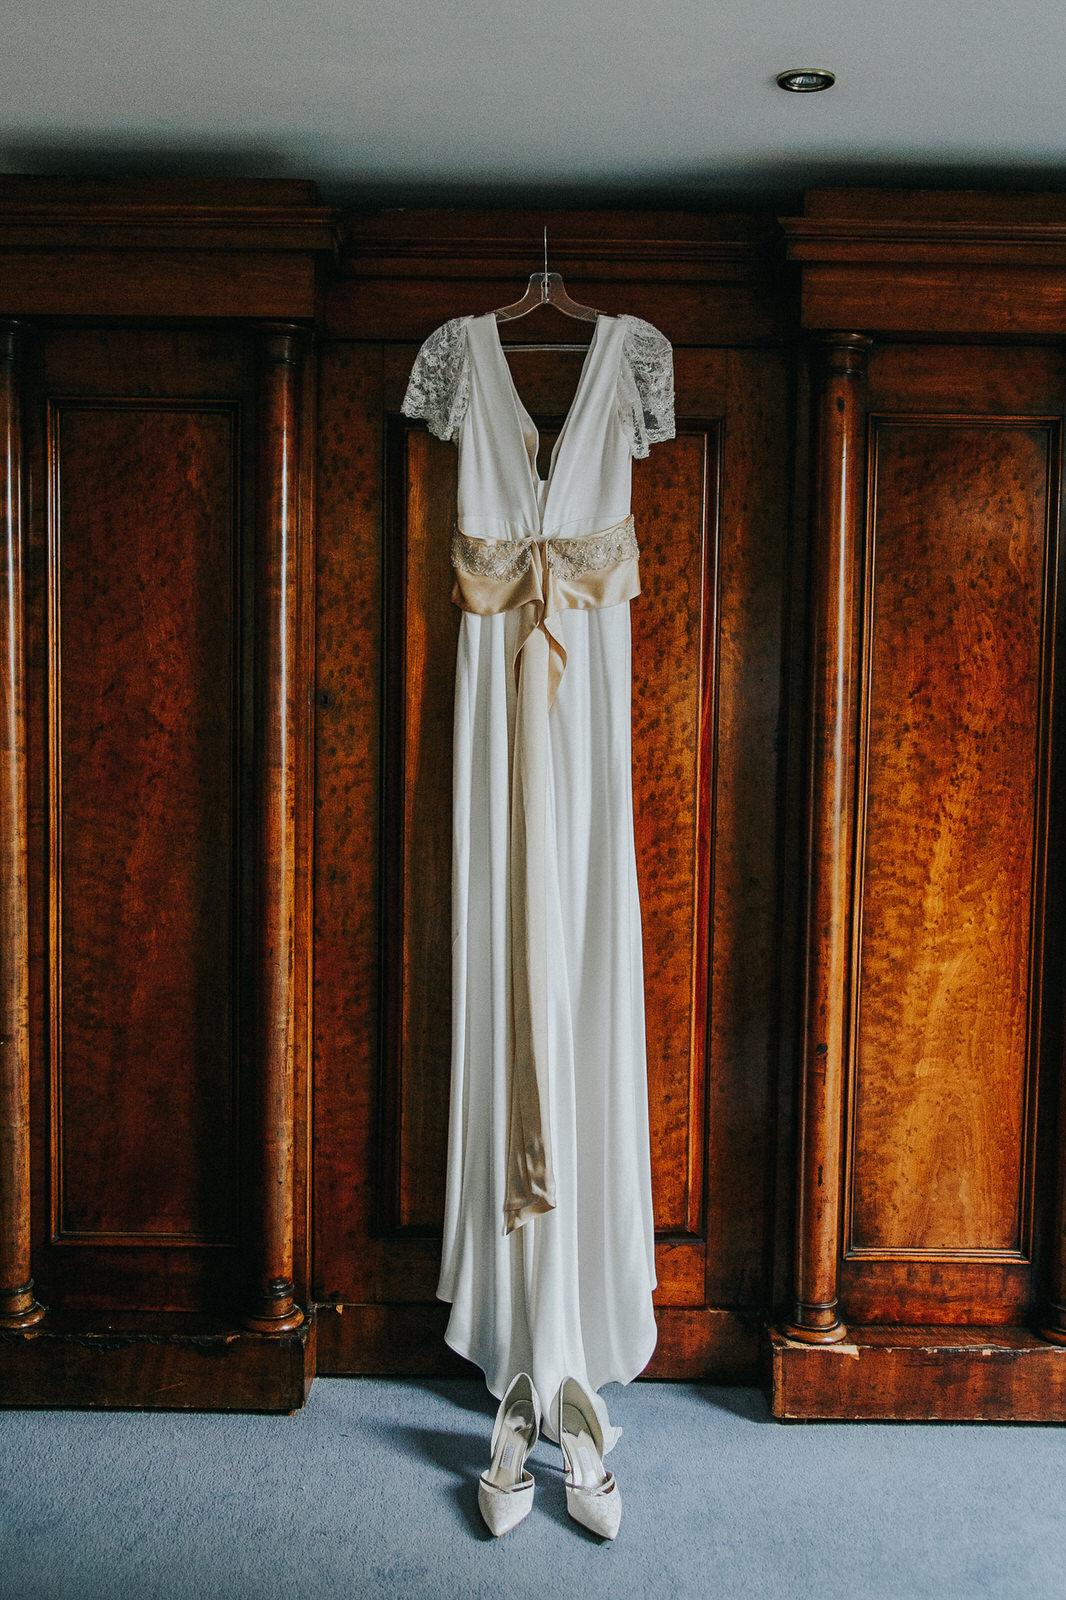 Dunbrody_House_Wedding_photographer_009.jpg